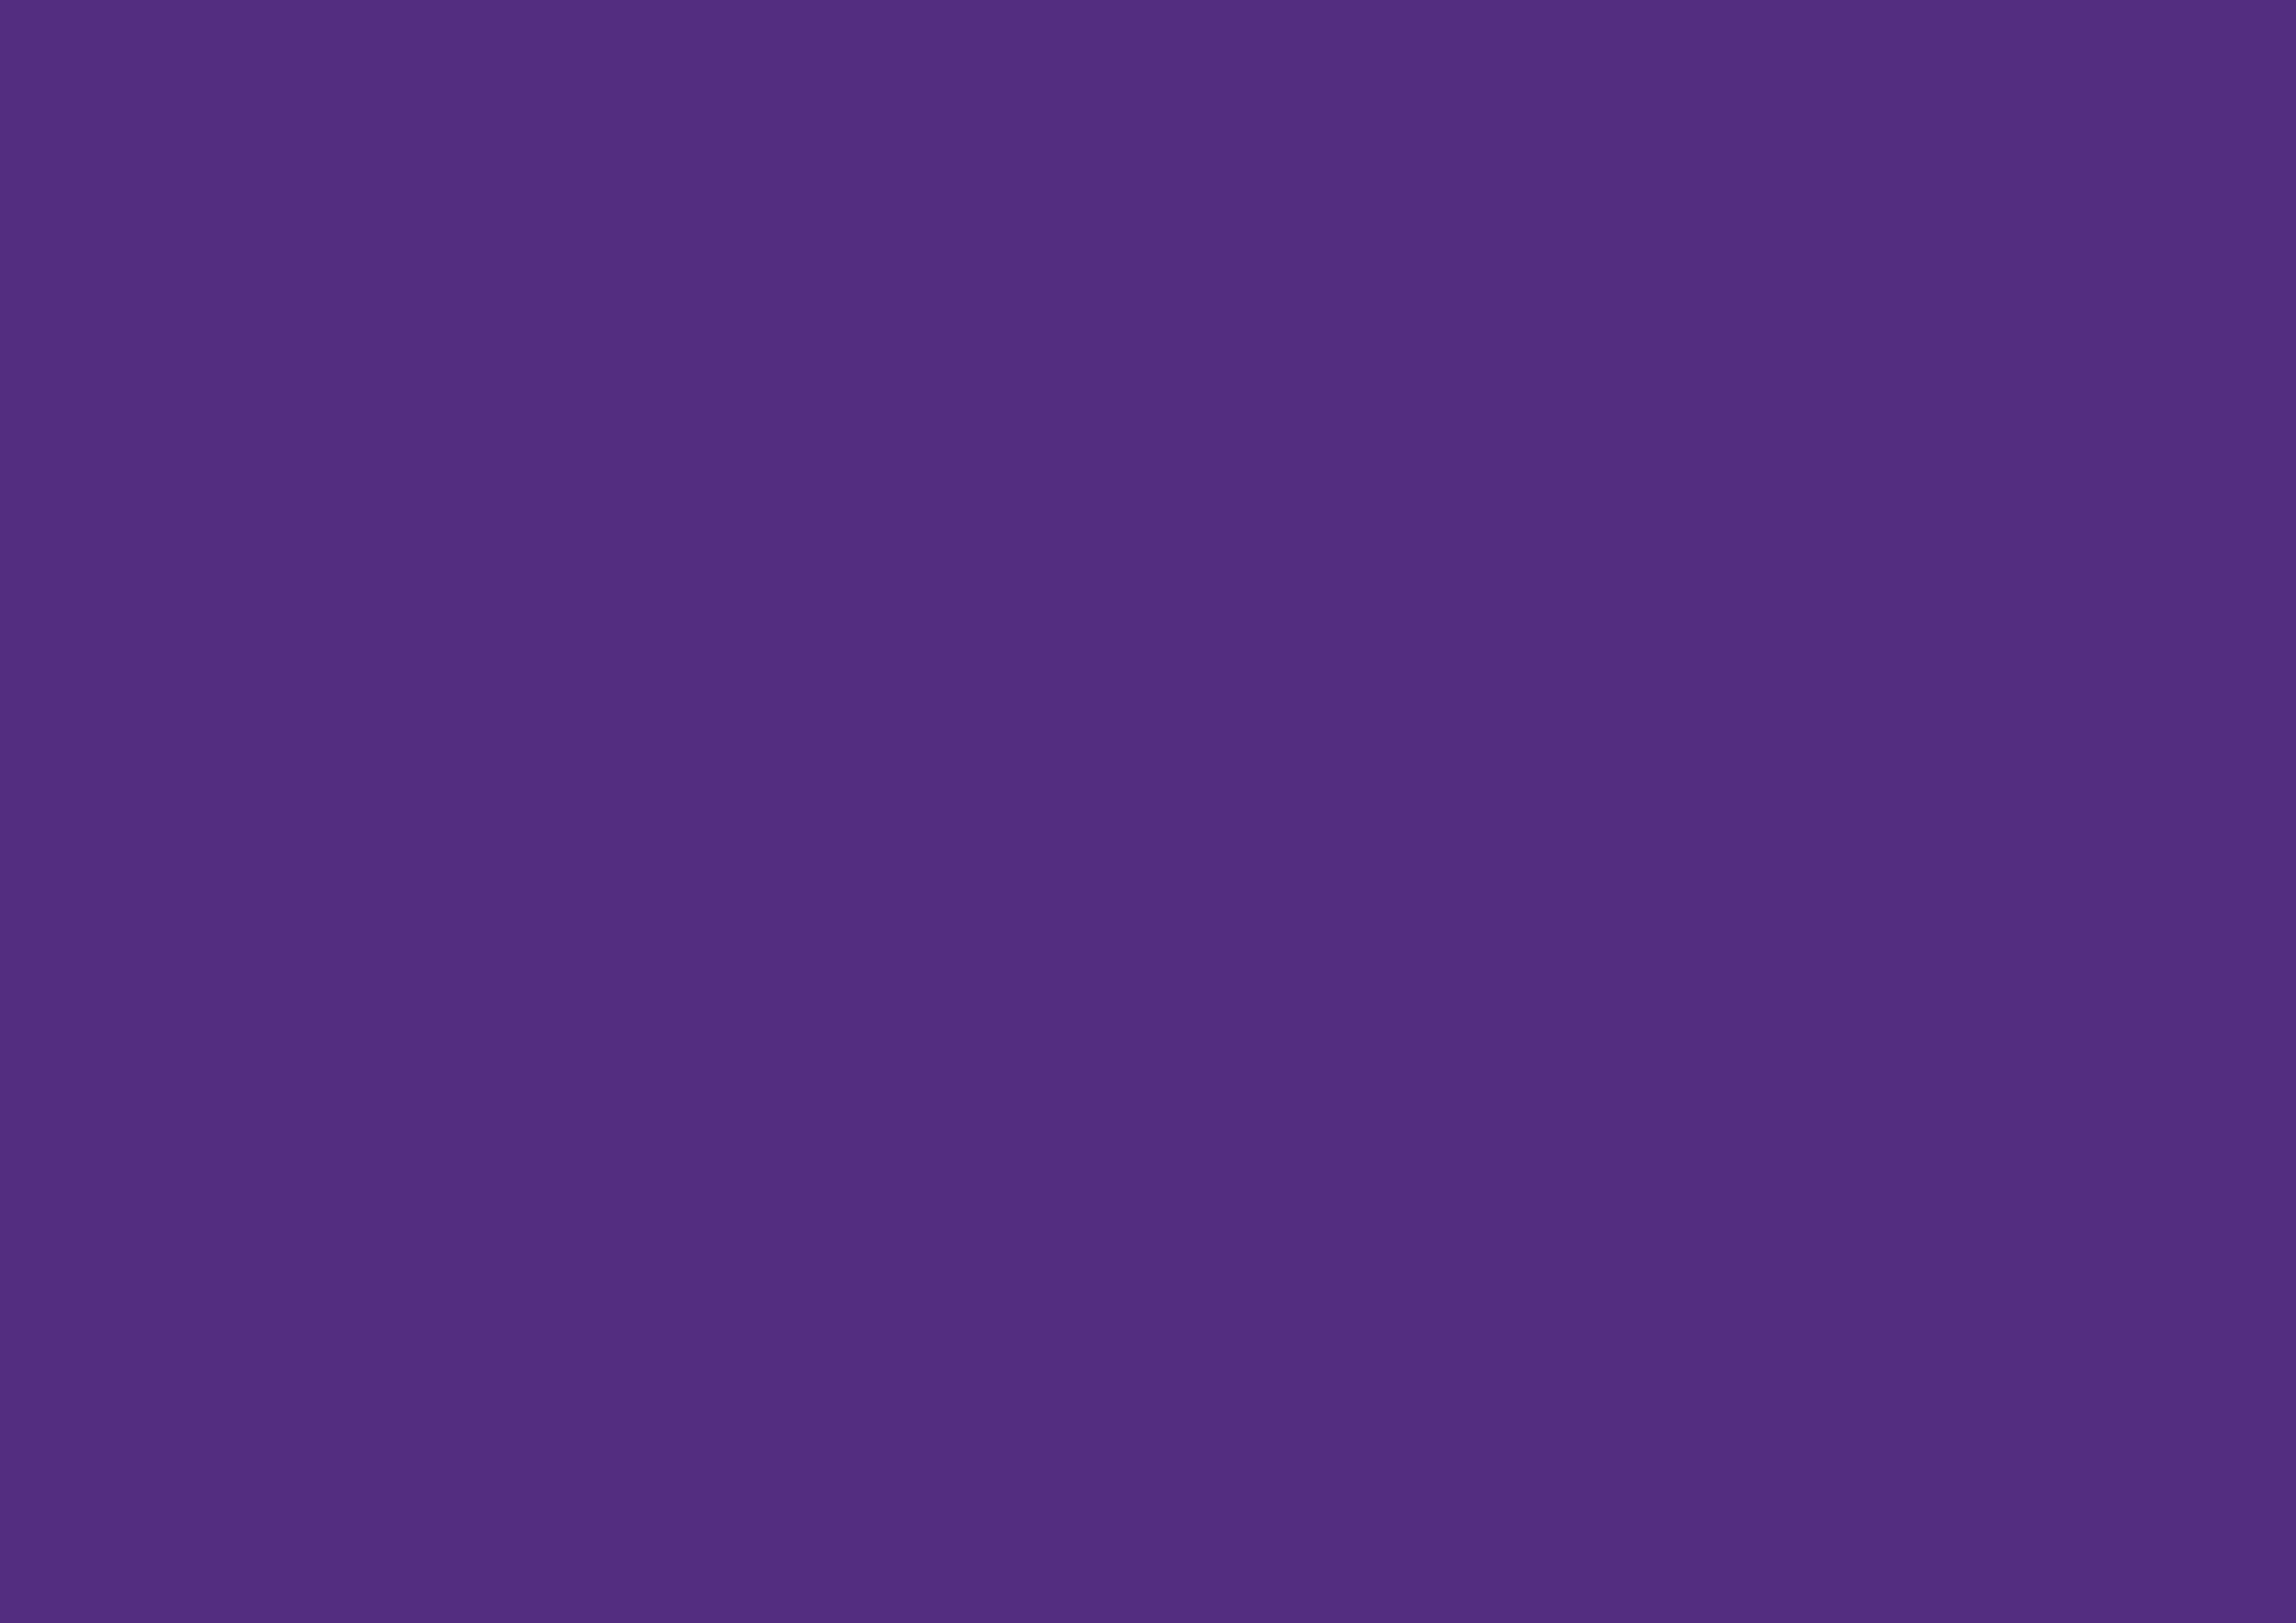 3508x2480 Regalia Solid Color Background